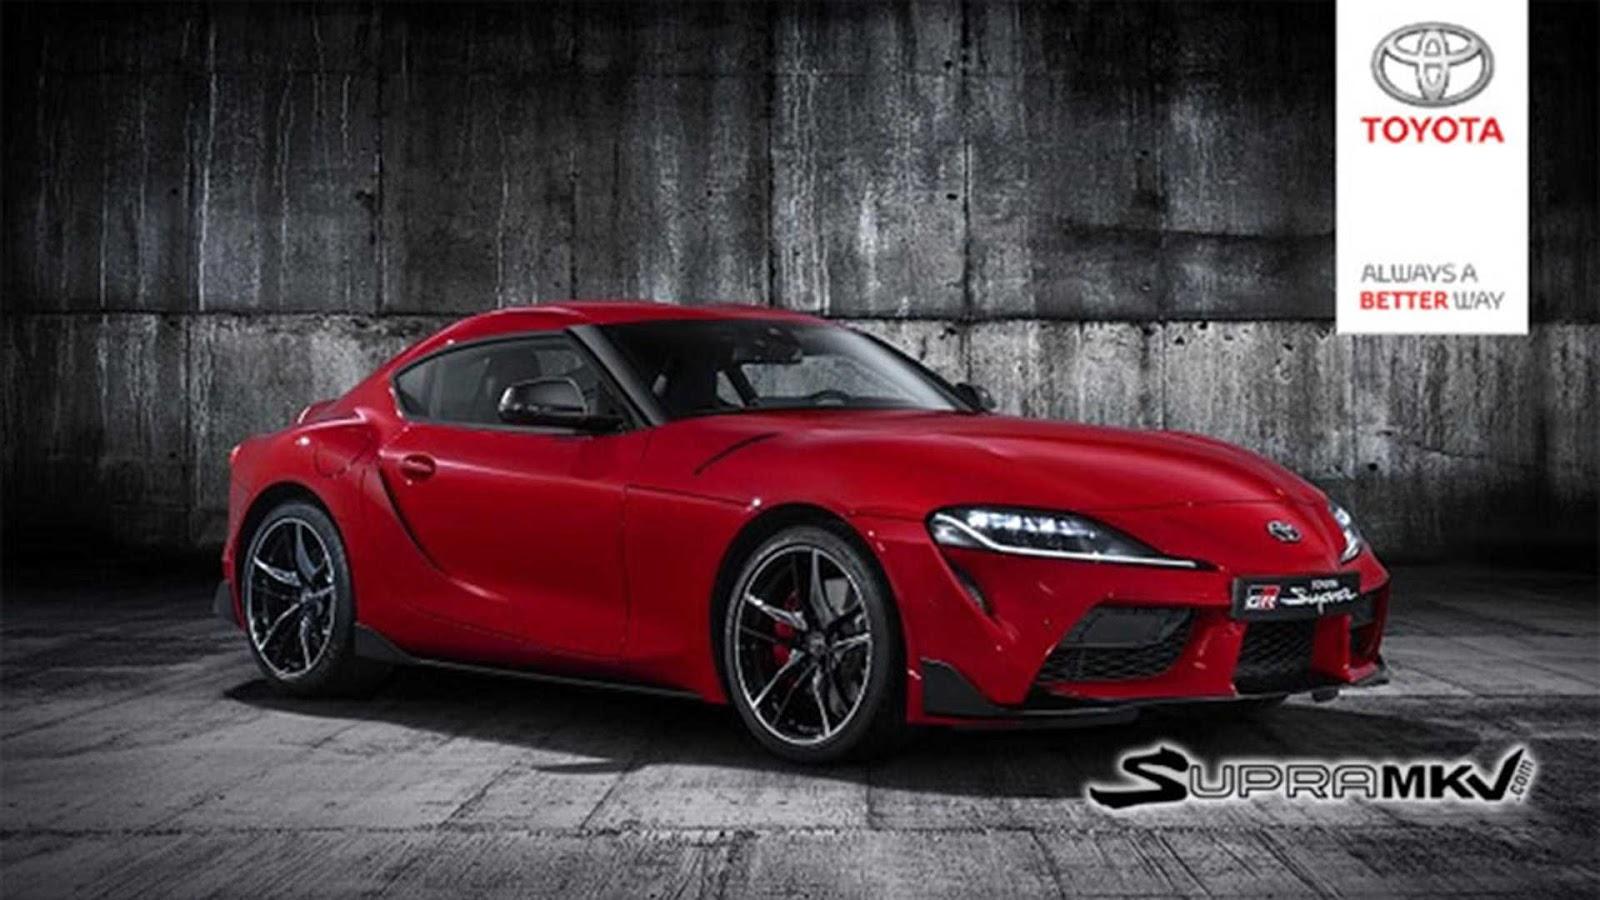 SUPRA2BFINAL1 Ιδού η νέα Toyota Supra! Toyota, Toyota Supra, zblog, μοντέλα, ΦΩΤΟ, φωτογραφίες